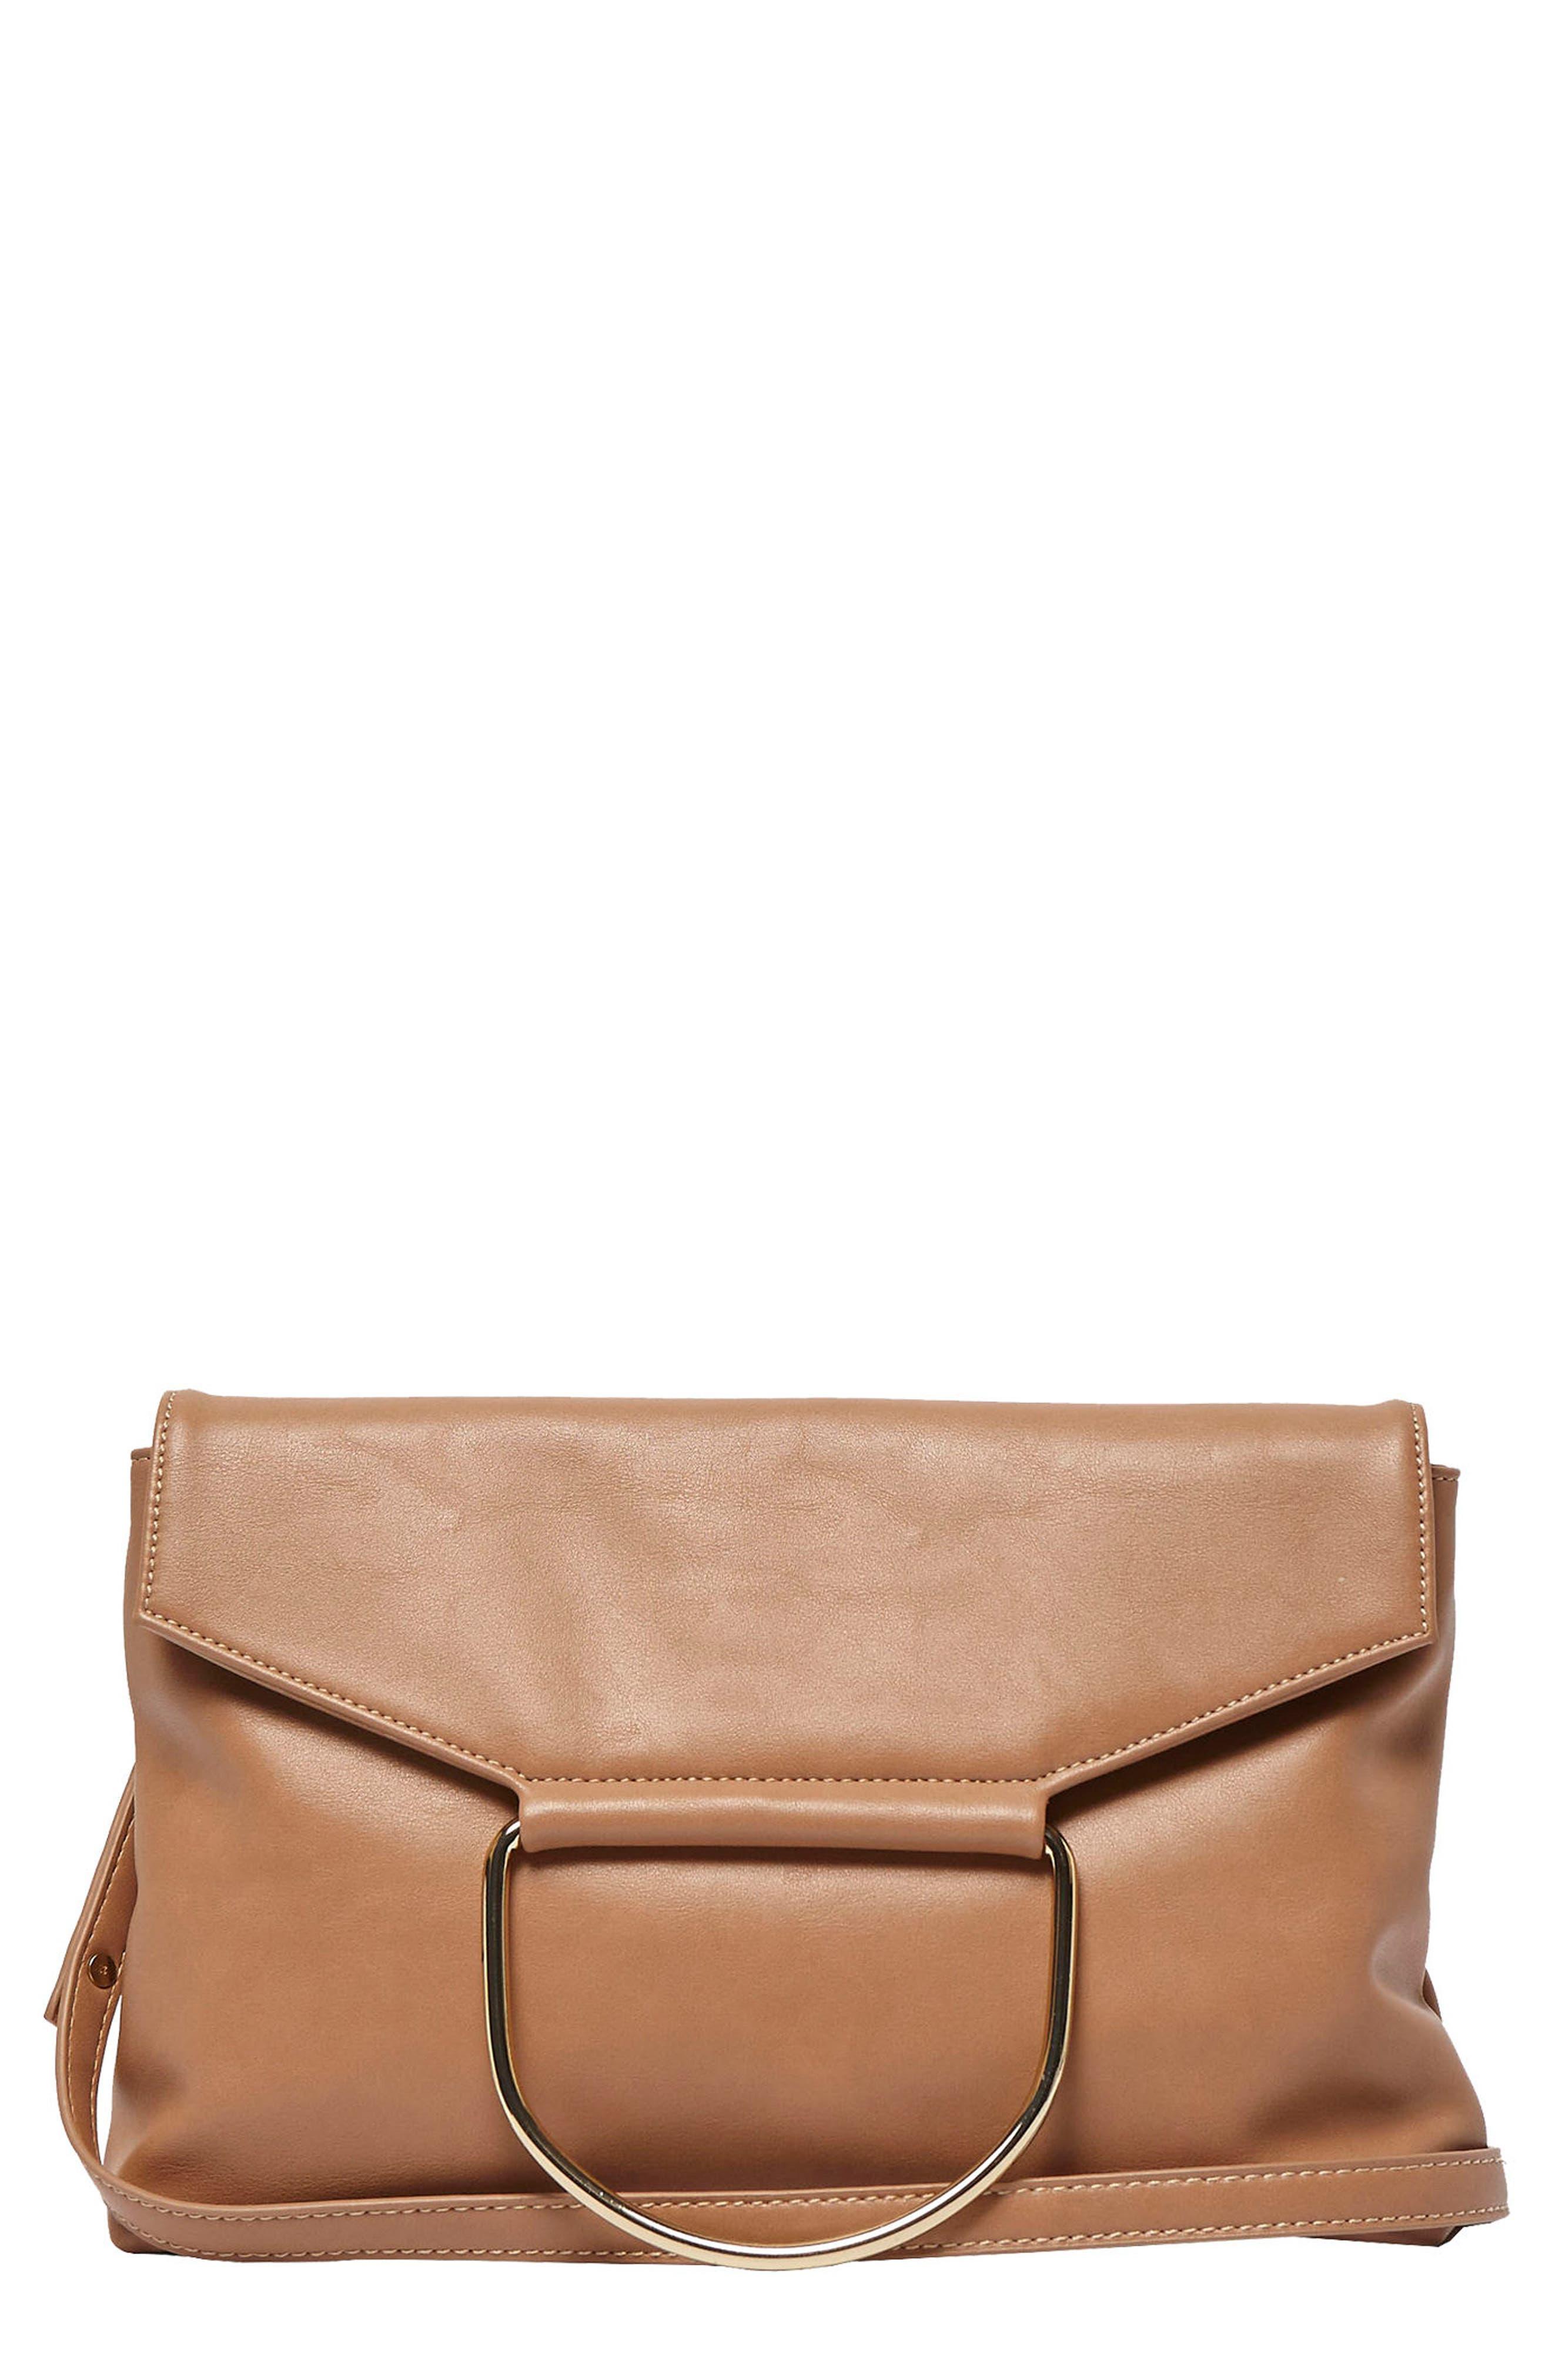 Urban Originals On Your Radar Vegan Leather Foldover Bag